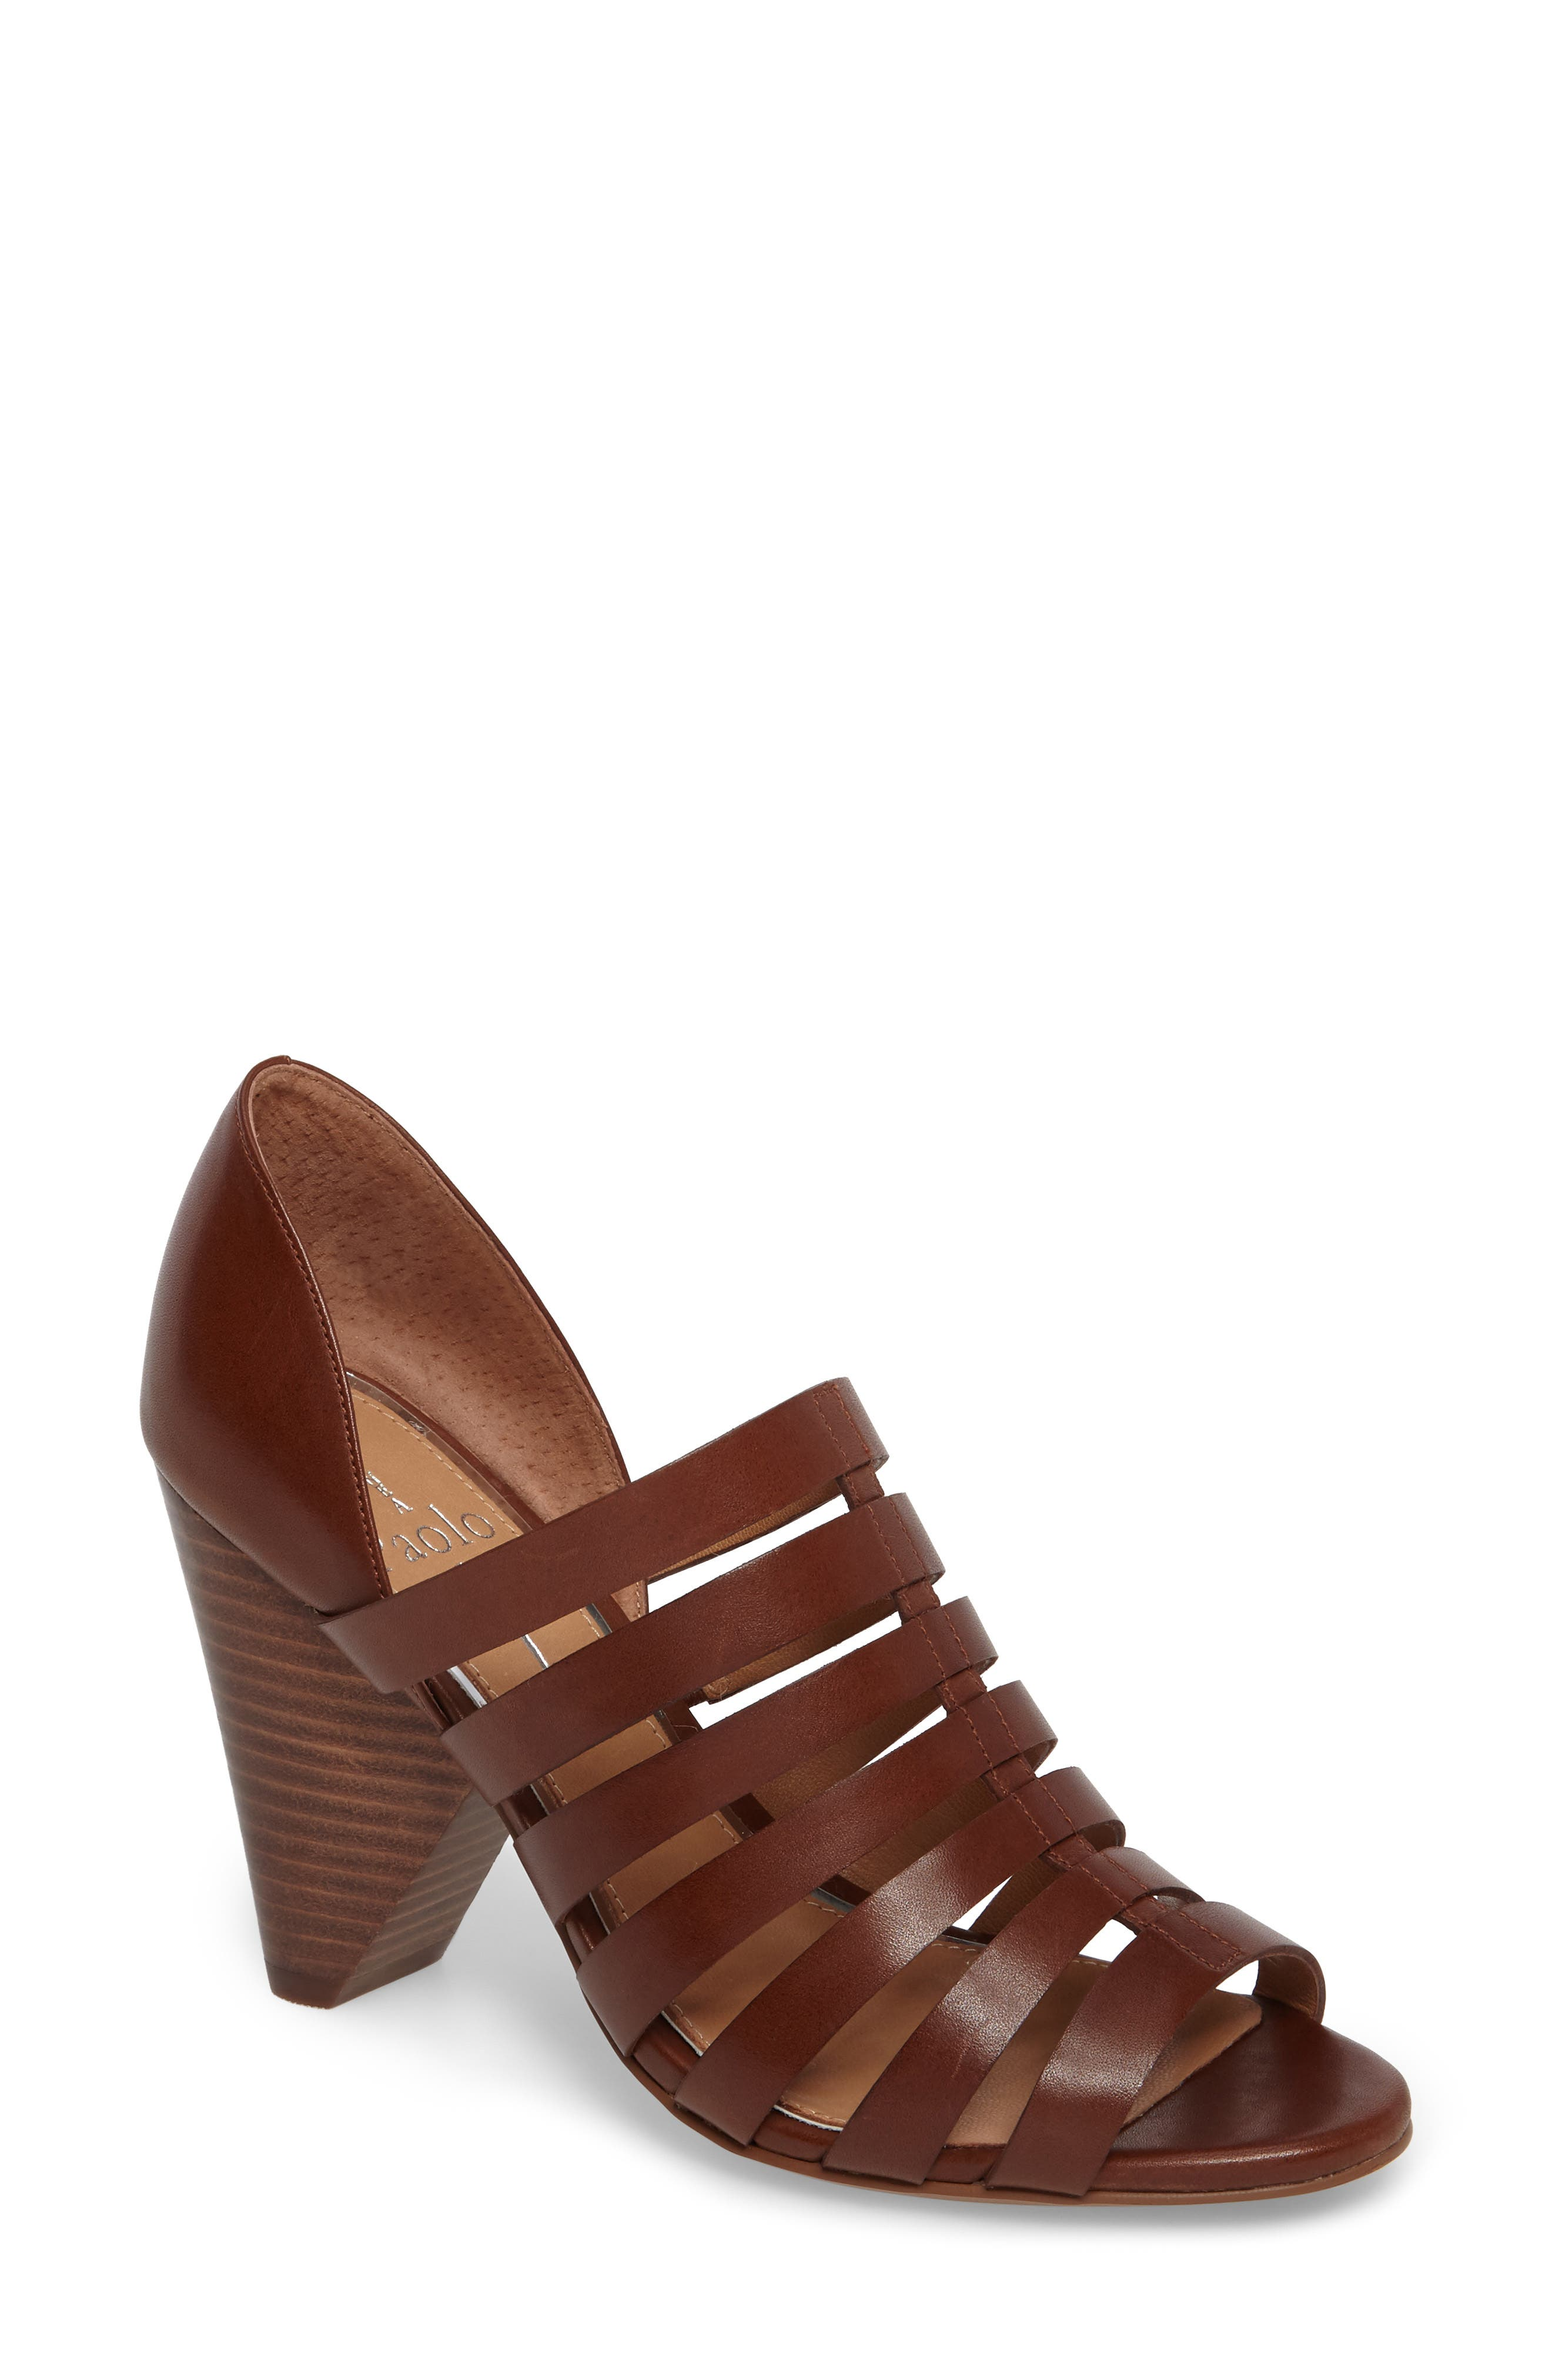 Alternate Image 1 Selected - Linea Paolo Pierce Chisel Heel Cage Sandal (Women)